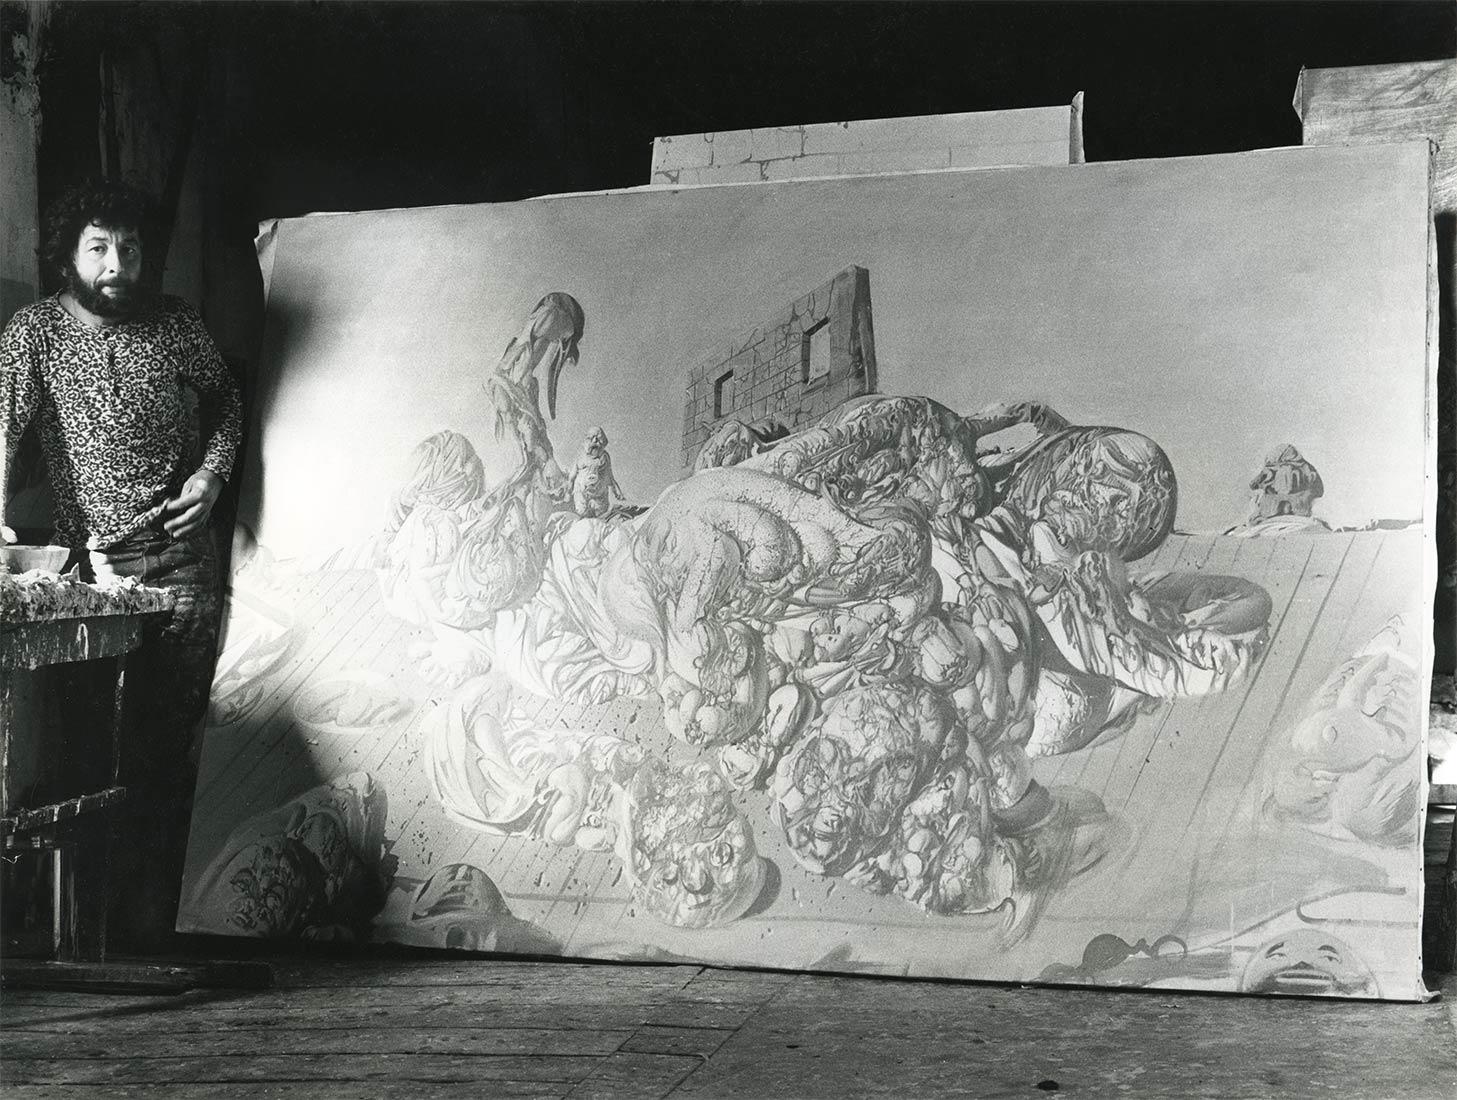 Dado at Hérouval in 1970